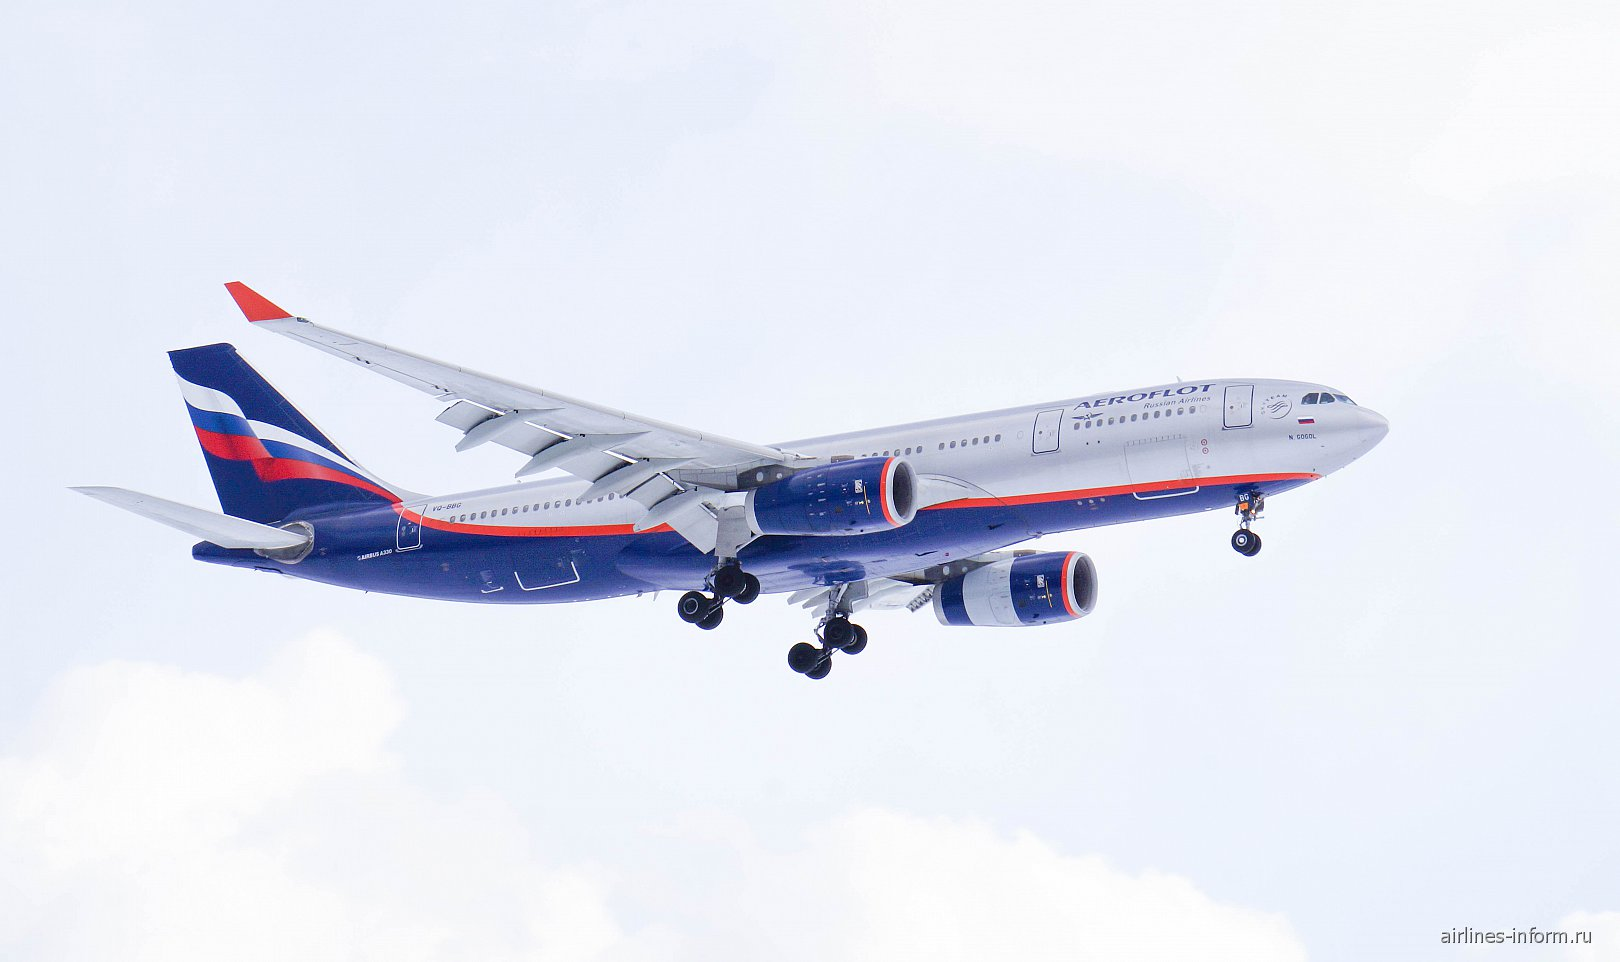 Самолет Аэрофлота Airbus A330-200 VQ-BBG